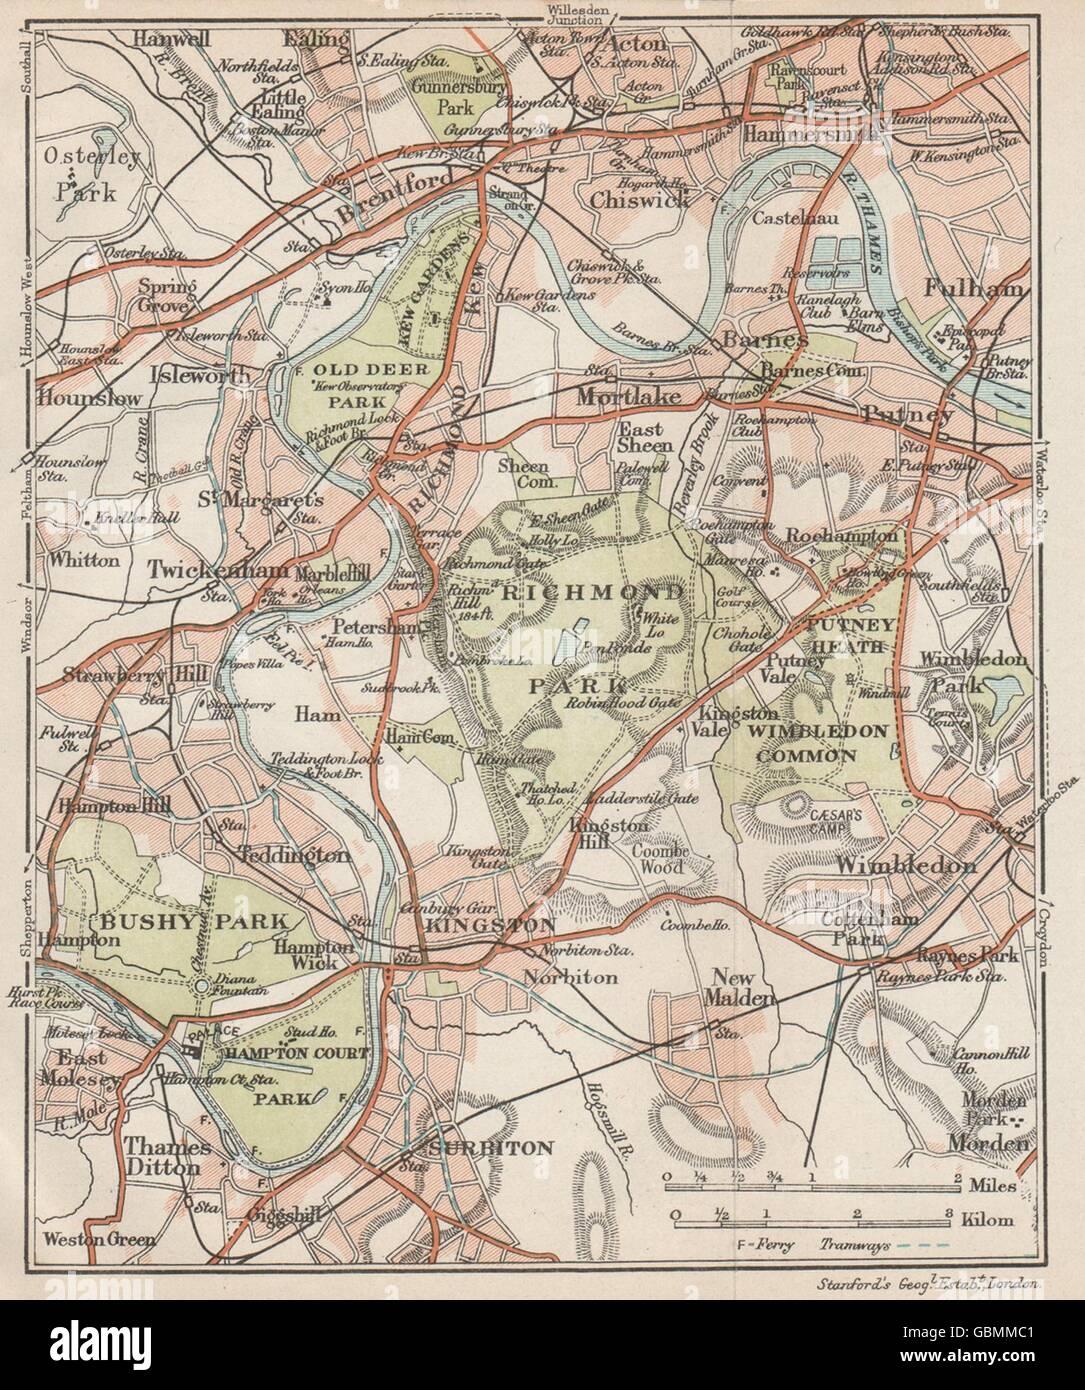 London Sw Map.Sw London Richmond Barnes Kingston Chiswick Wimbledon Kew Bushy